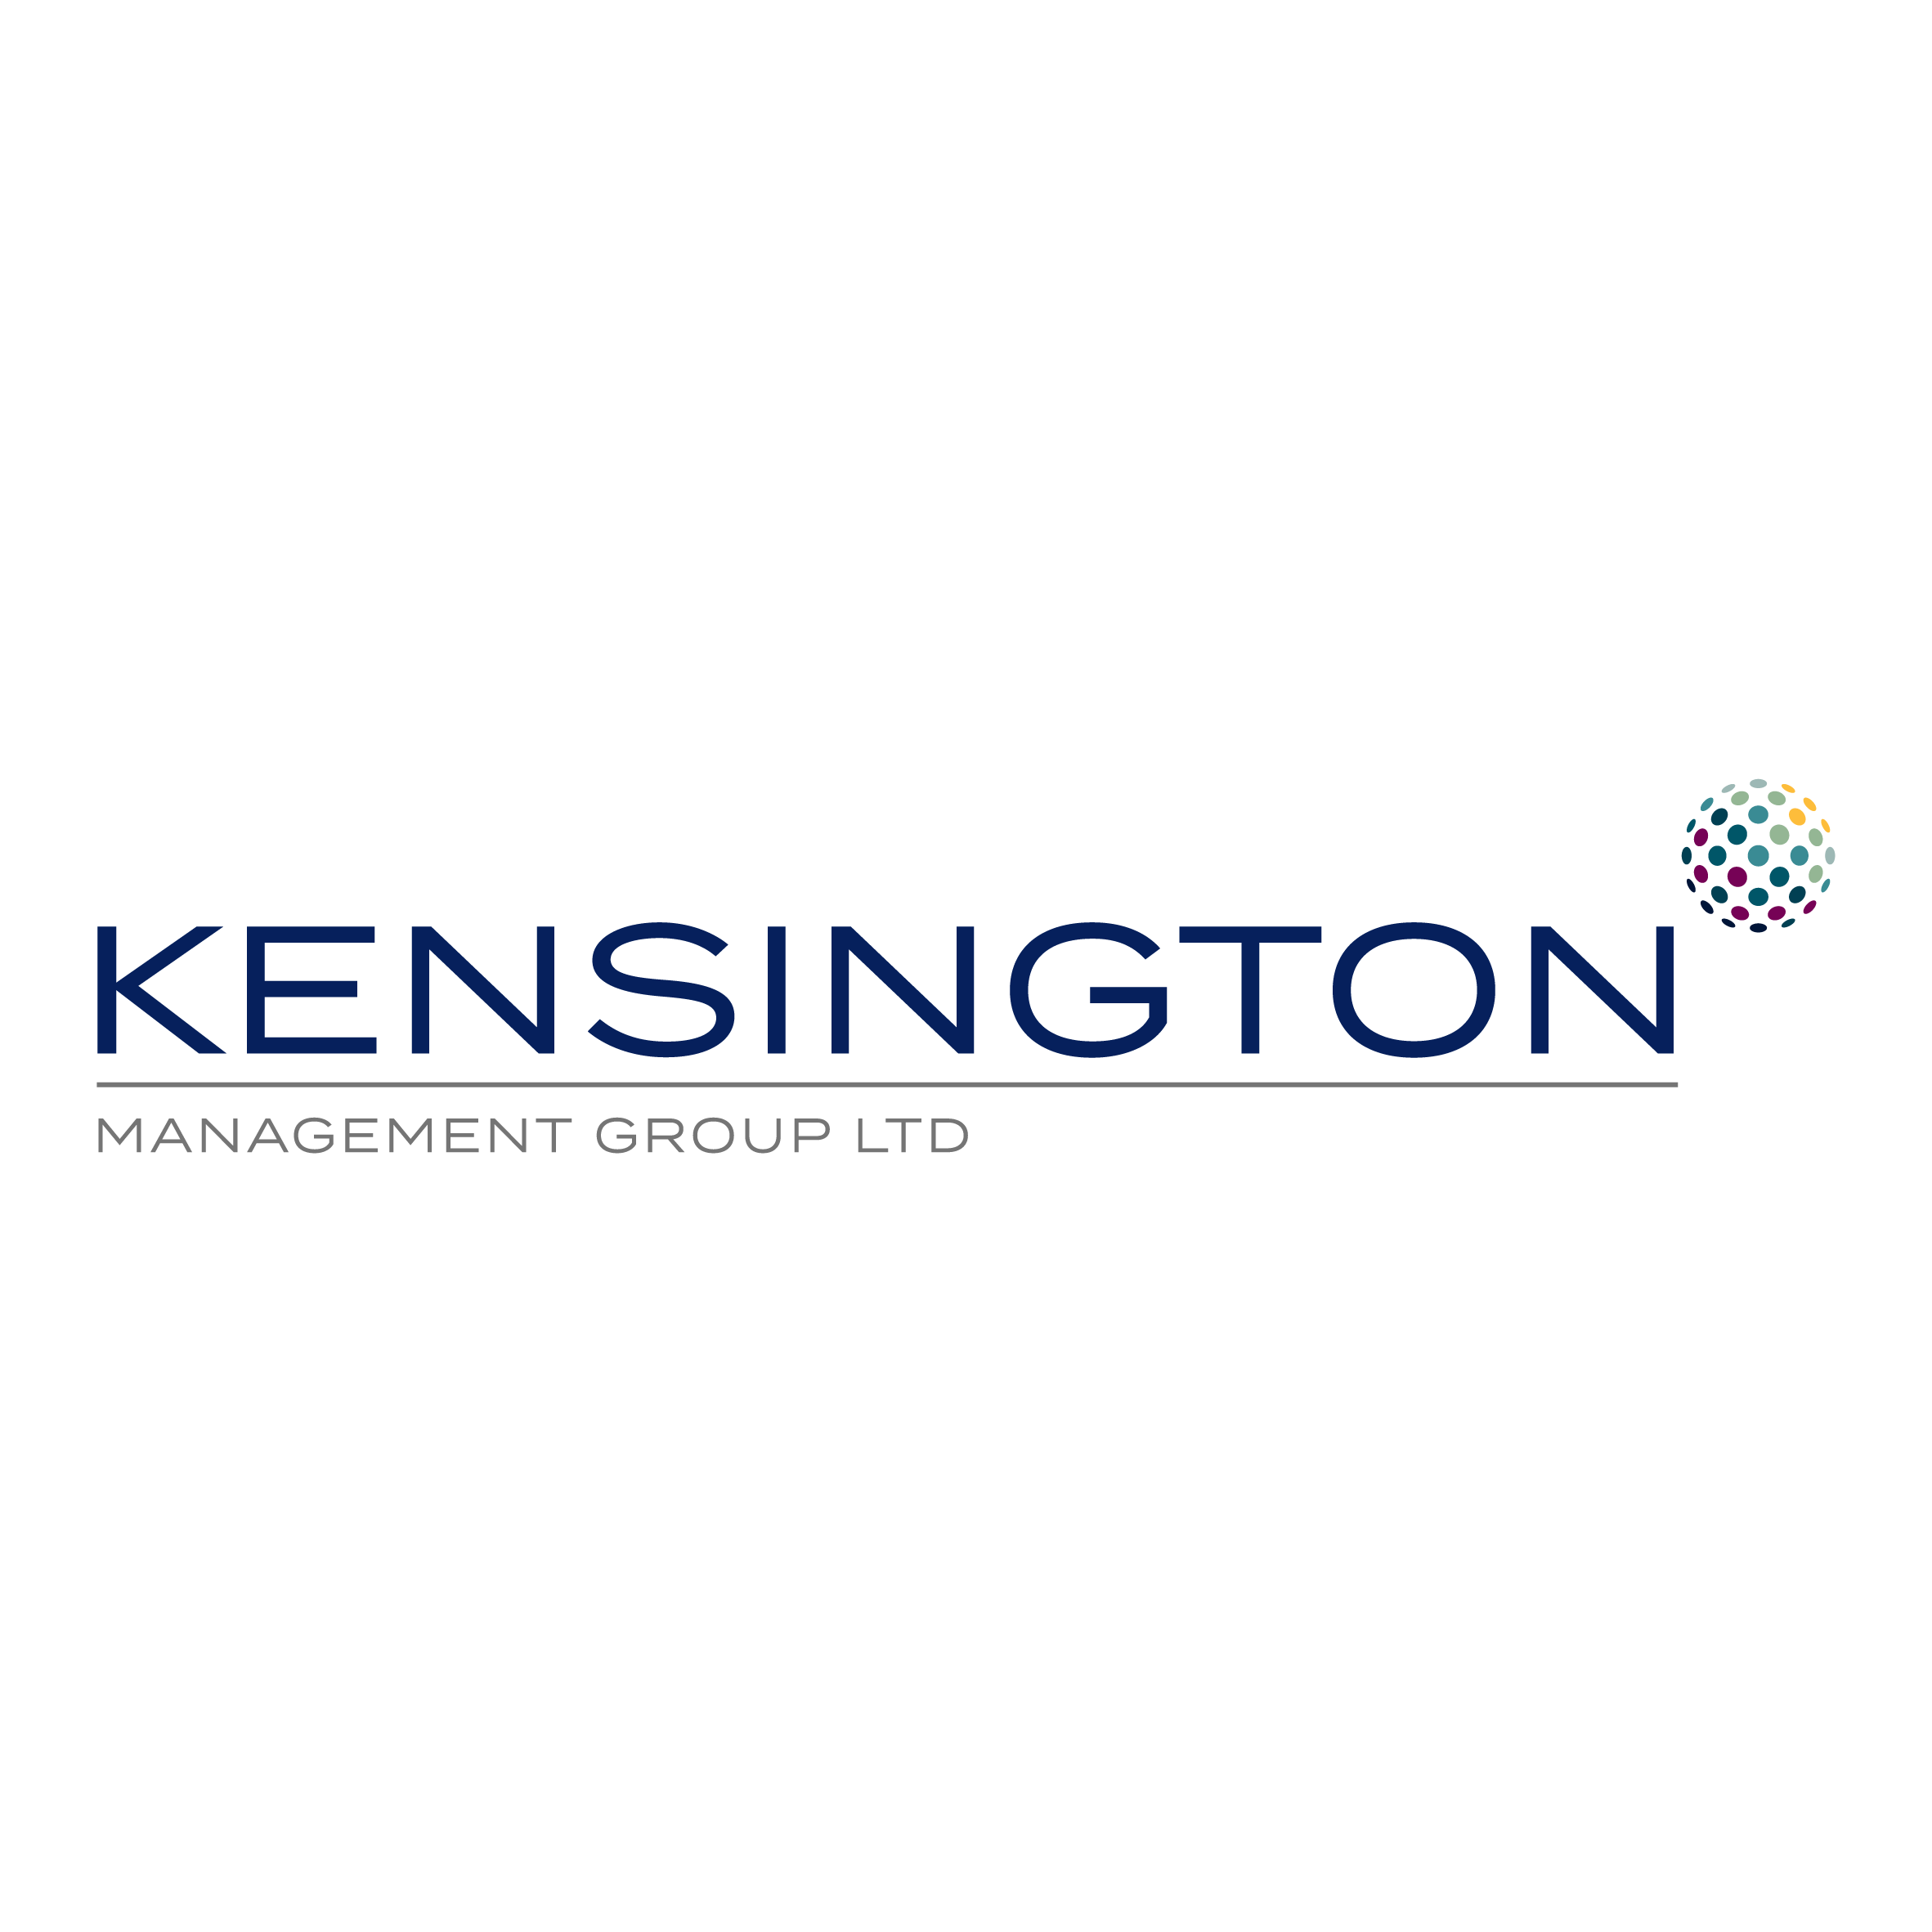 Kensington Management Group Ltd. logo.